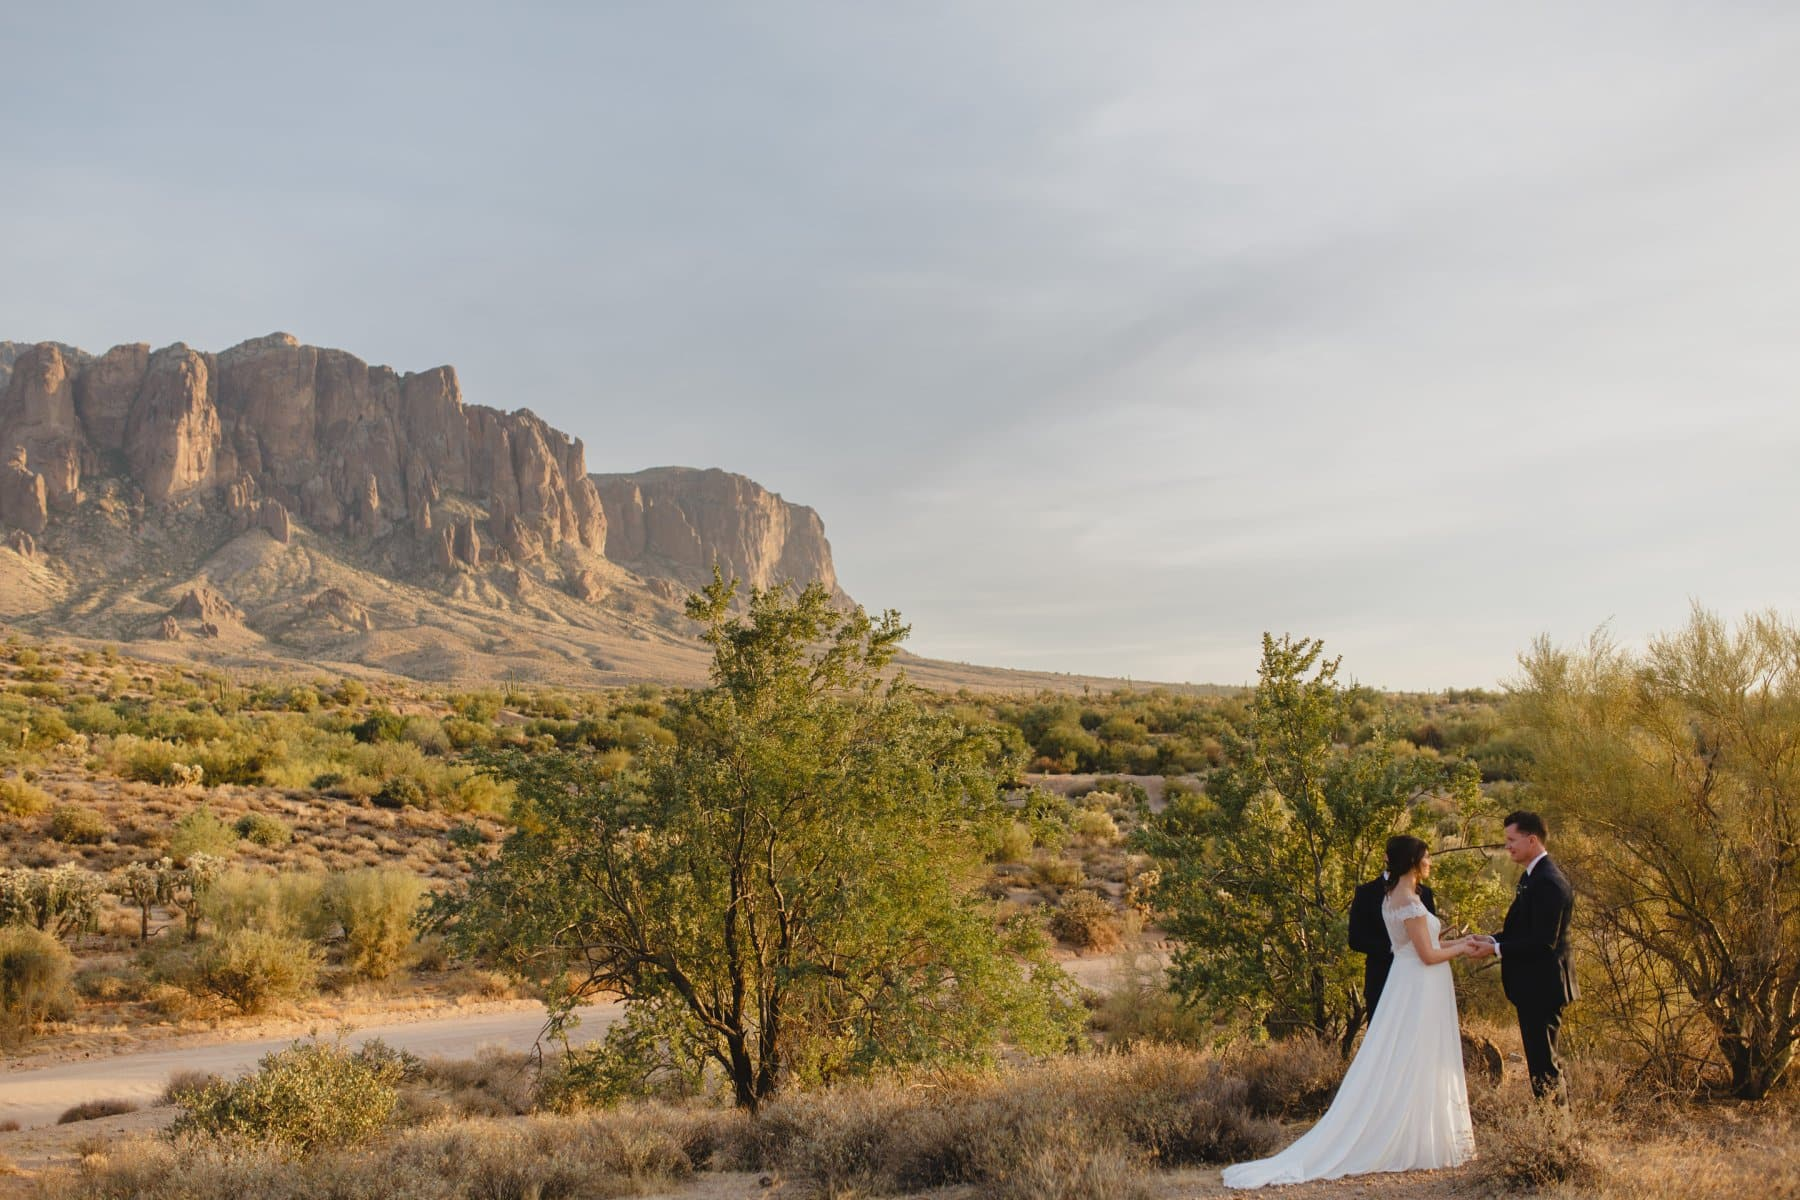 beautiful Arizona desert and mountains elopement location